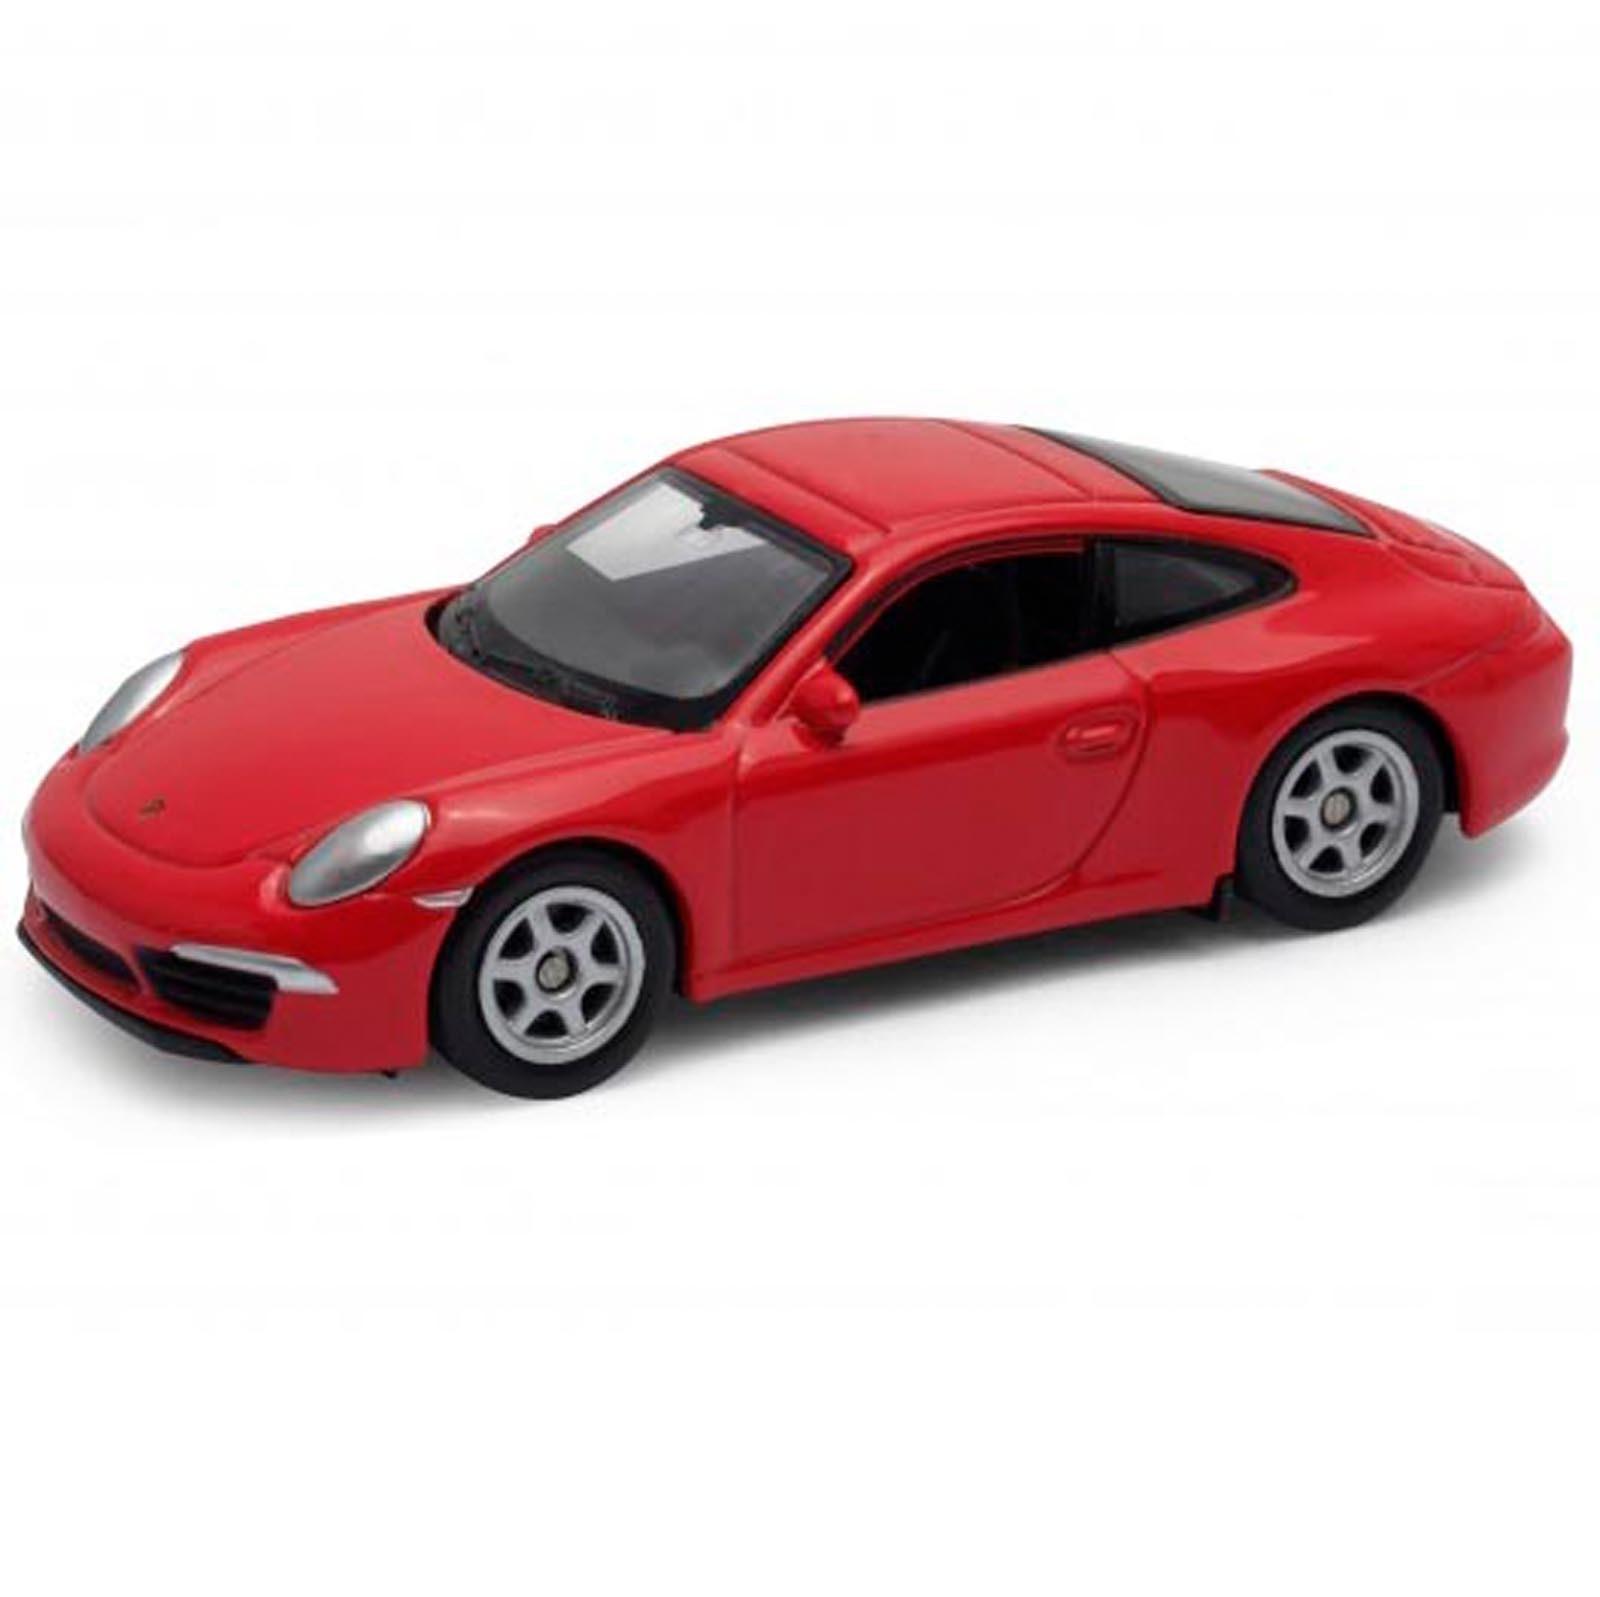 Miniatura - 1:64 - Porsche 911 Carrera S - California Minis - Welly